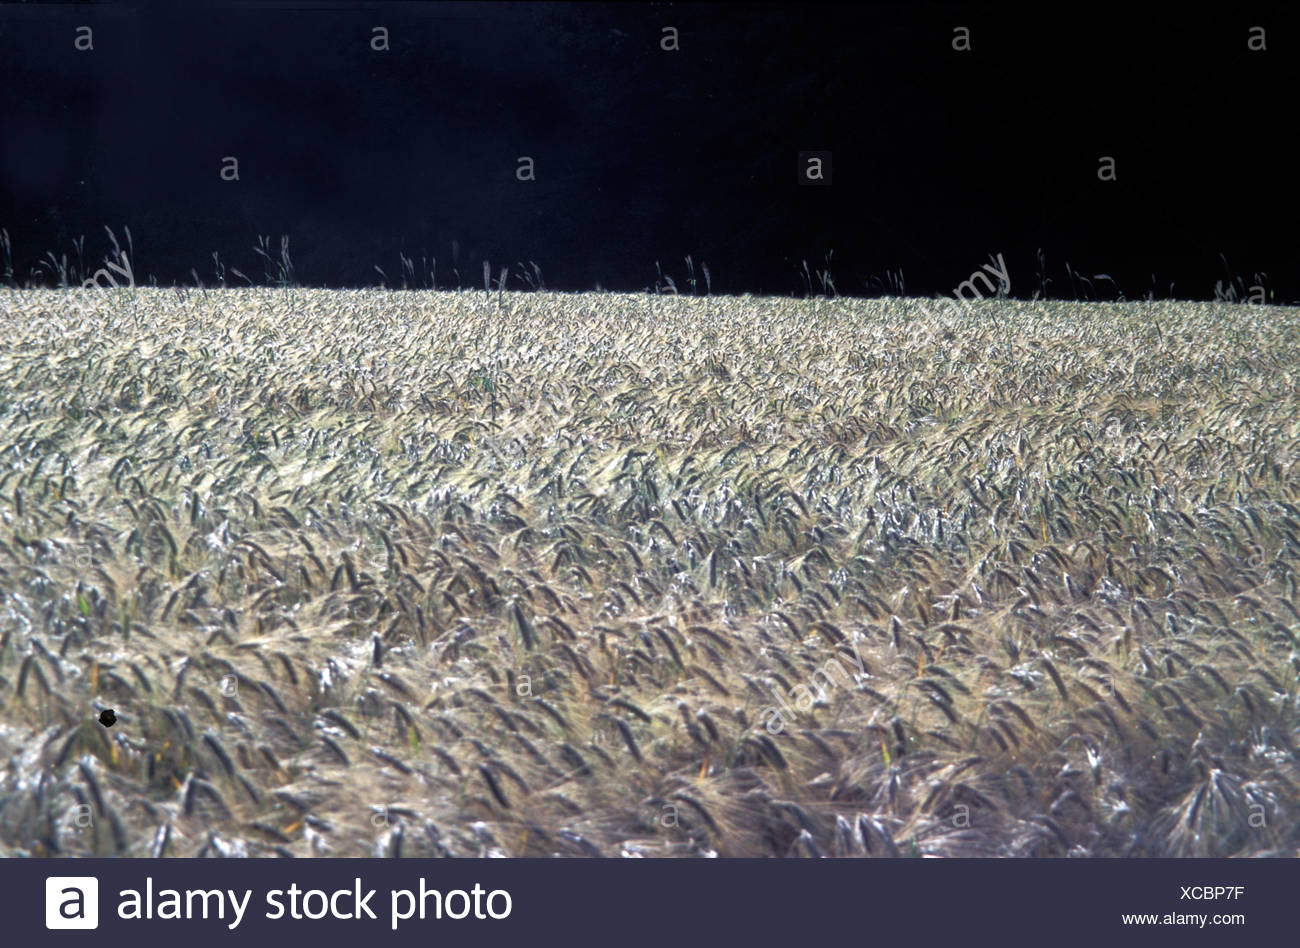 Barley field black sky - Stock Image